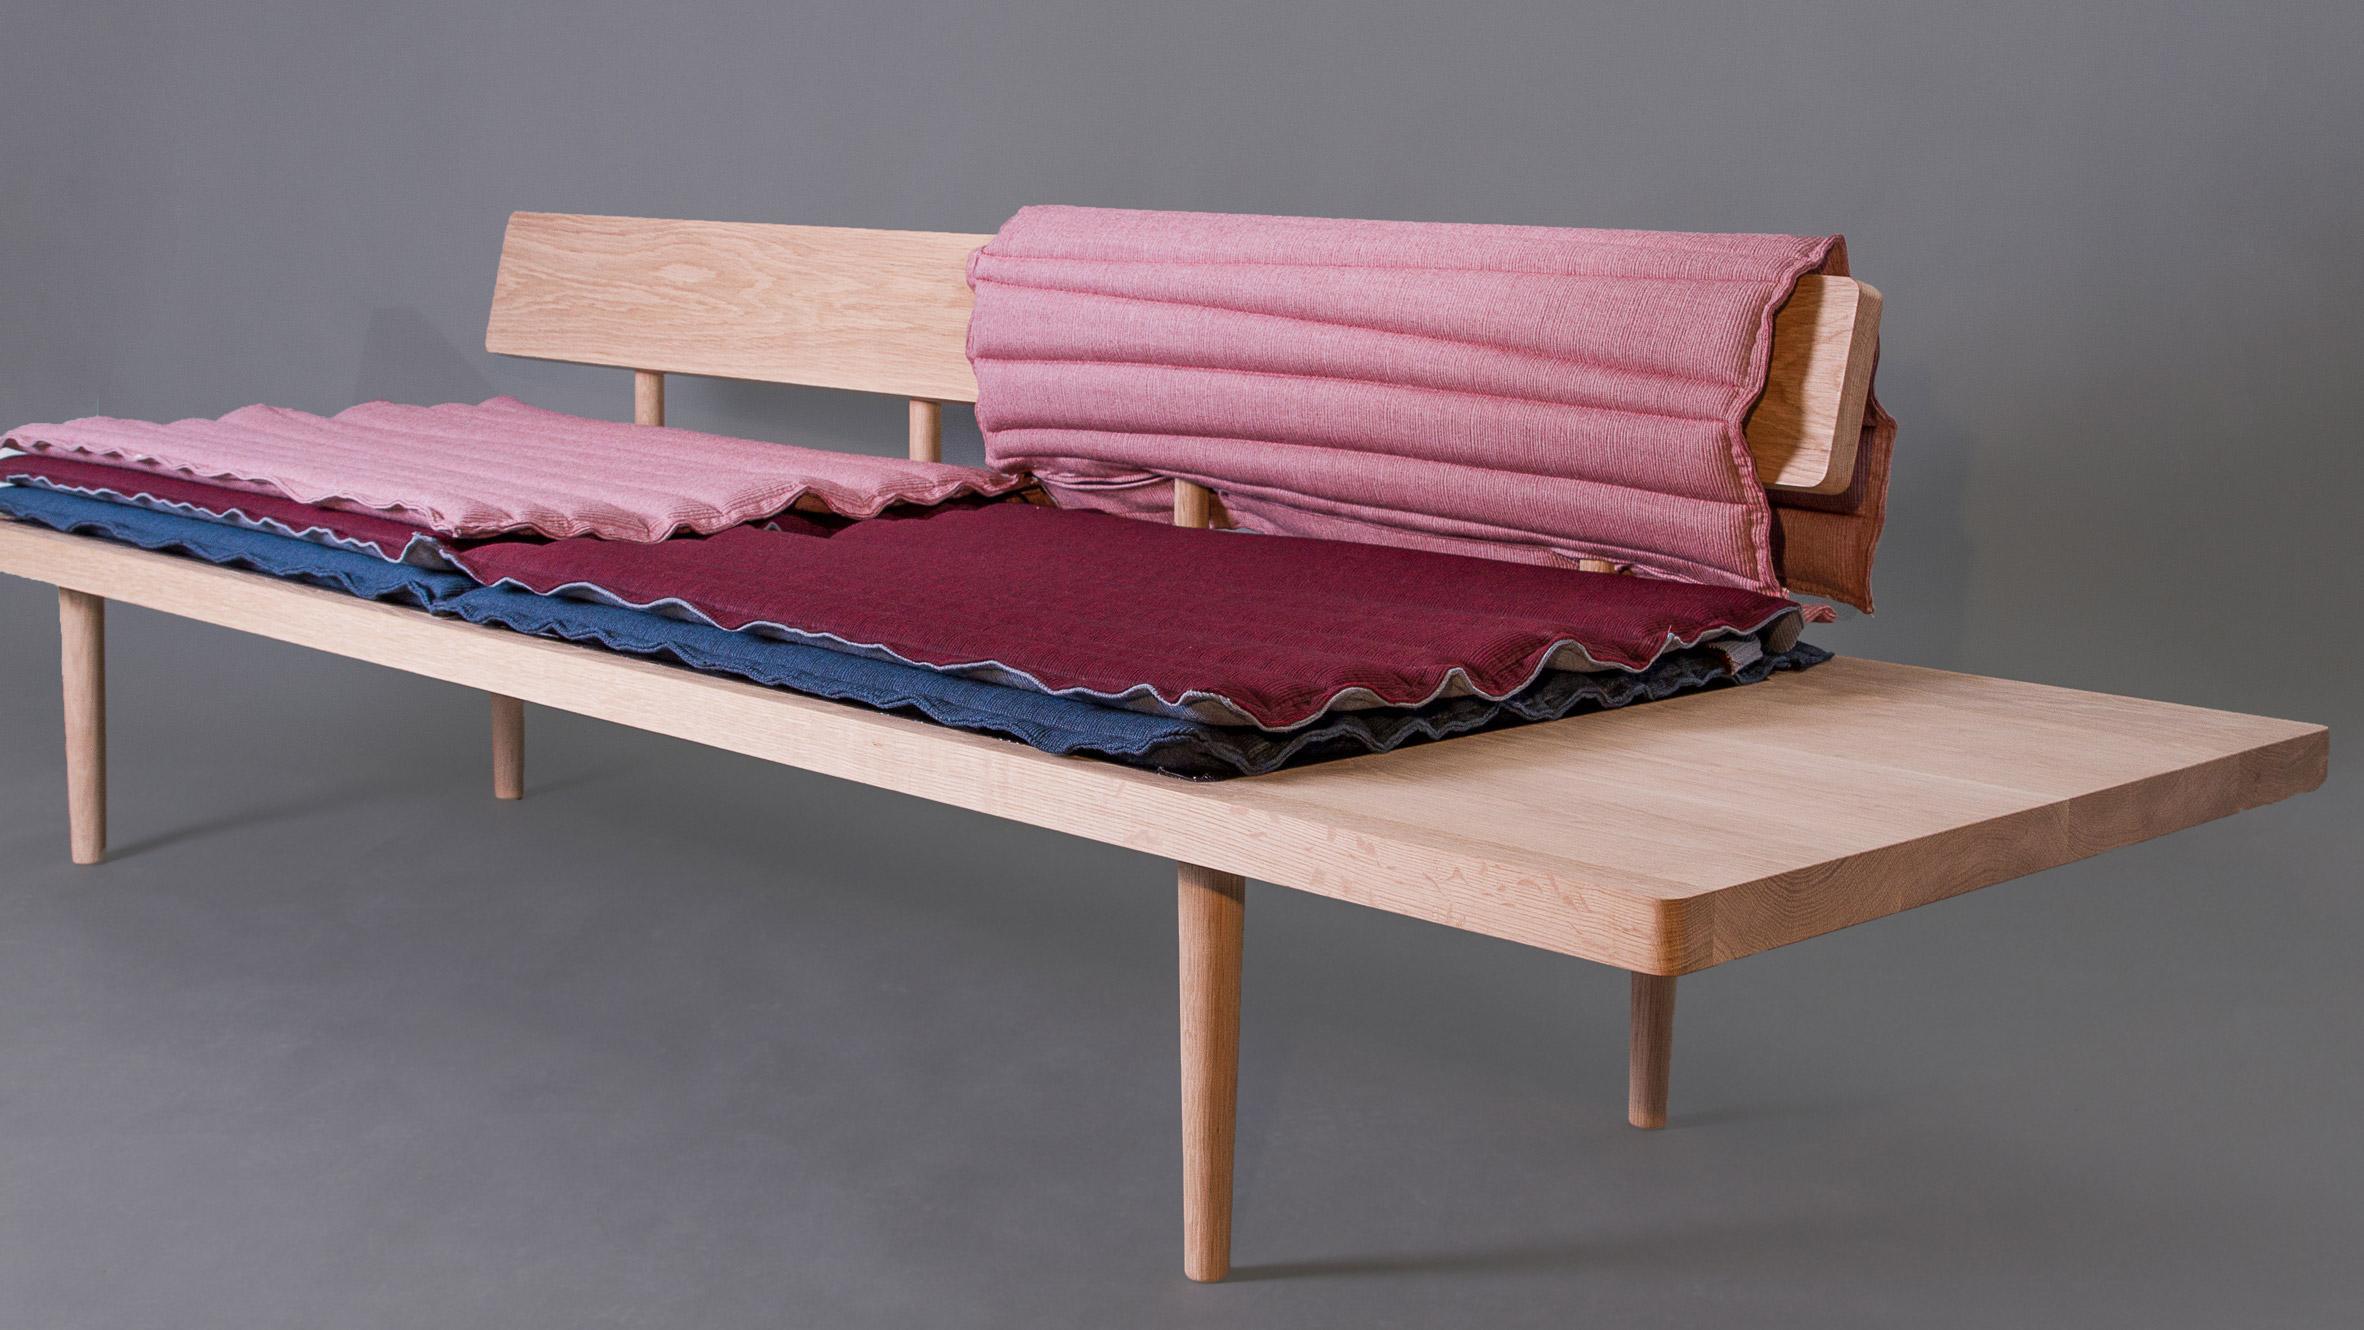 furniture-for-a-norvegian-prisiners05